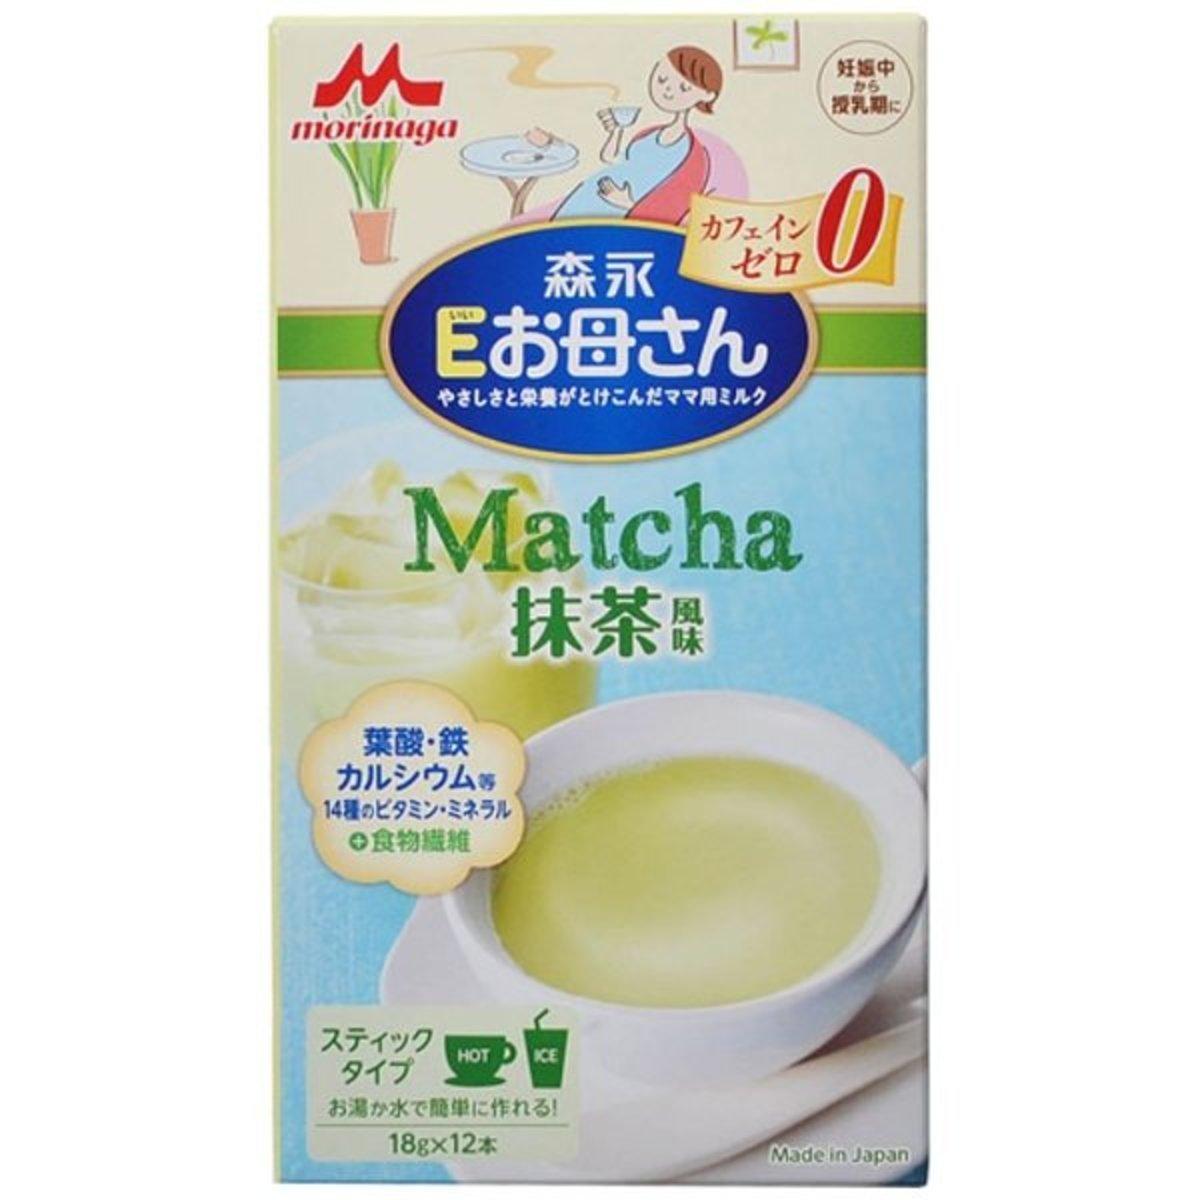 Morinaga孕婦/產婦營養補充奶粉 (抹茶味) (平行進口貨品)